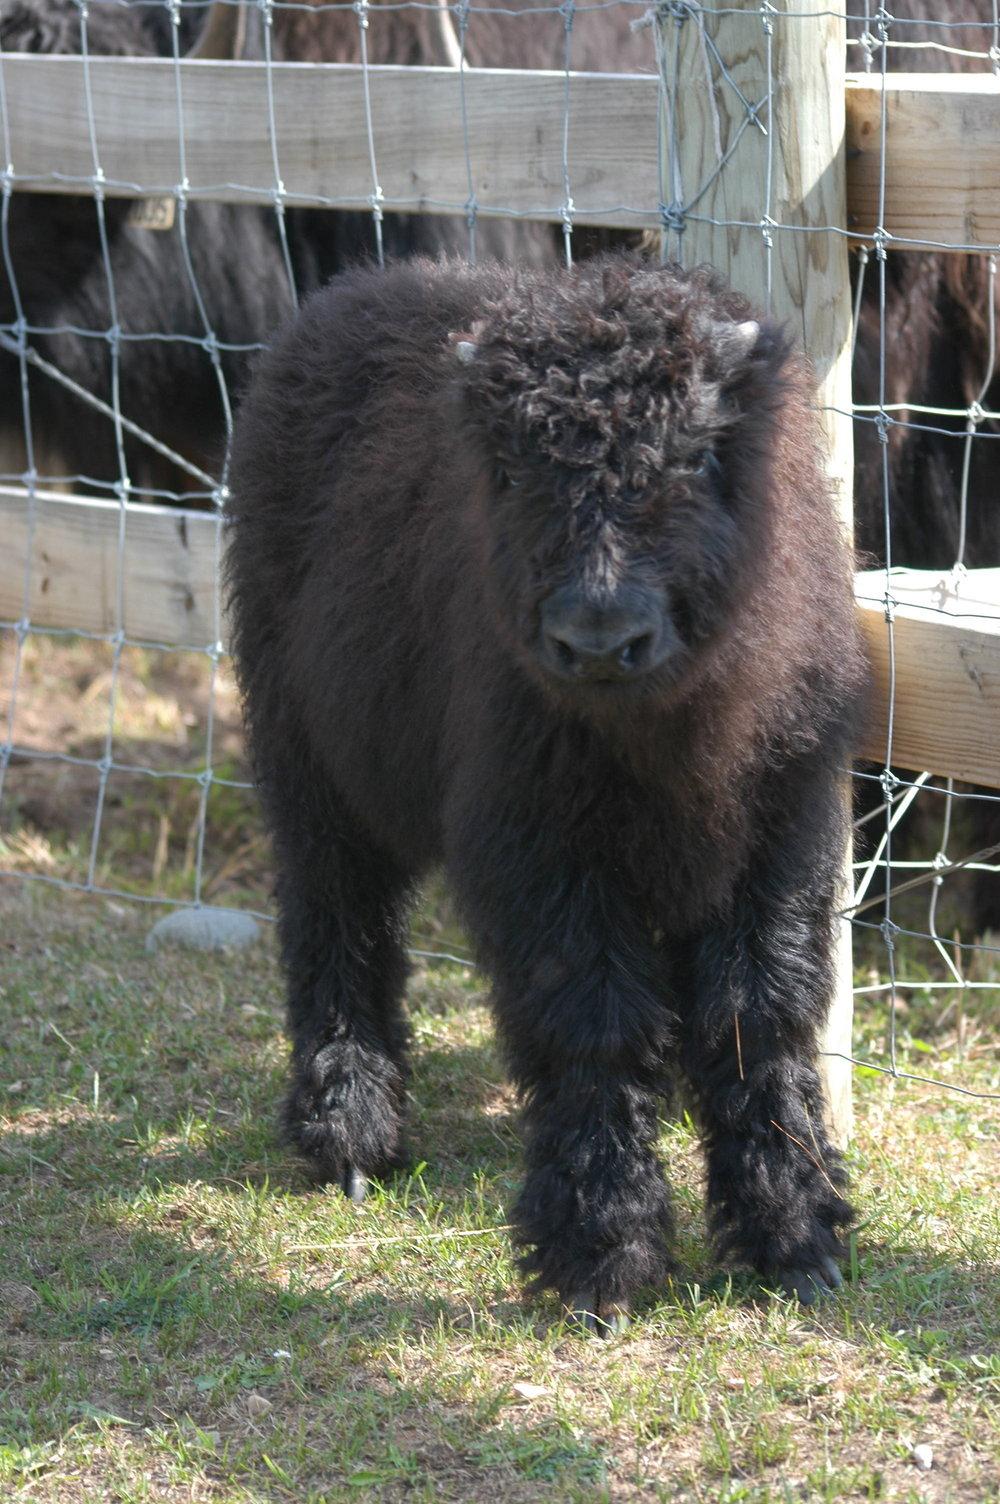 Everest, Eleven's 2014 calf